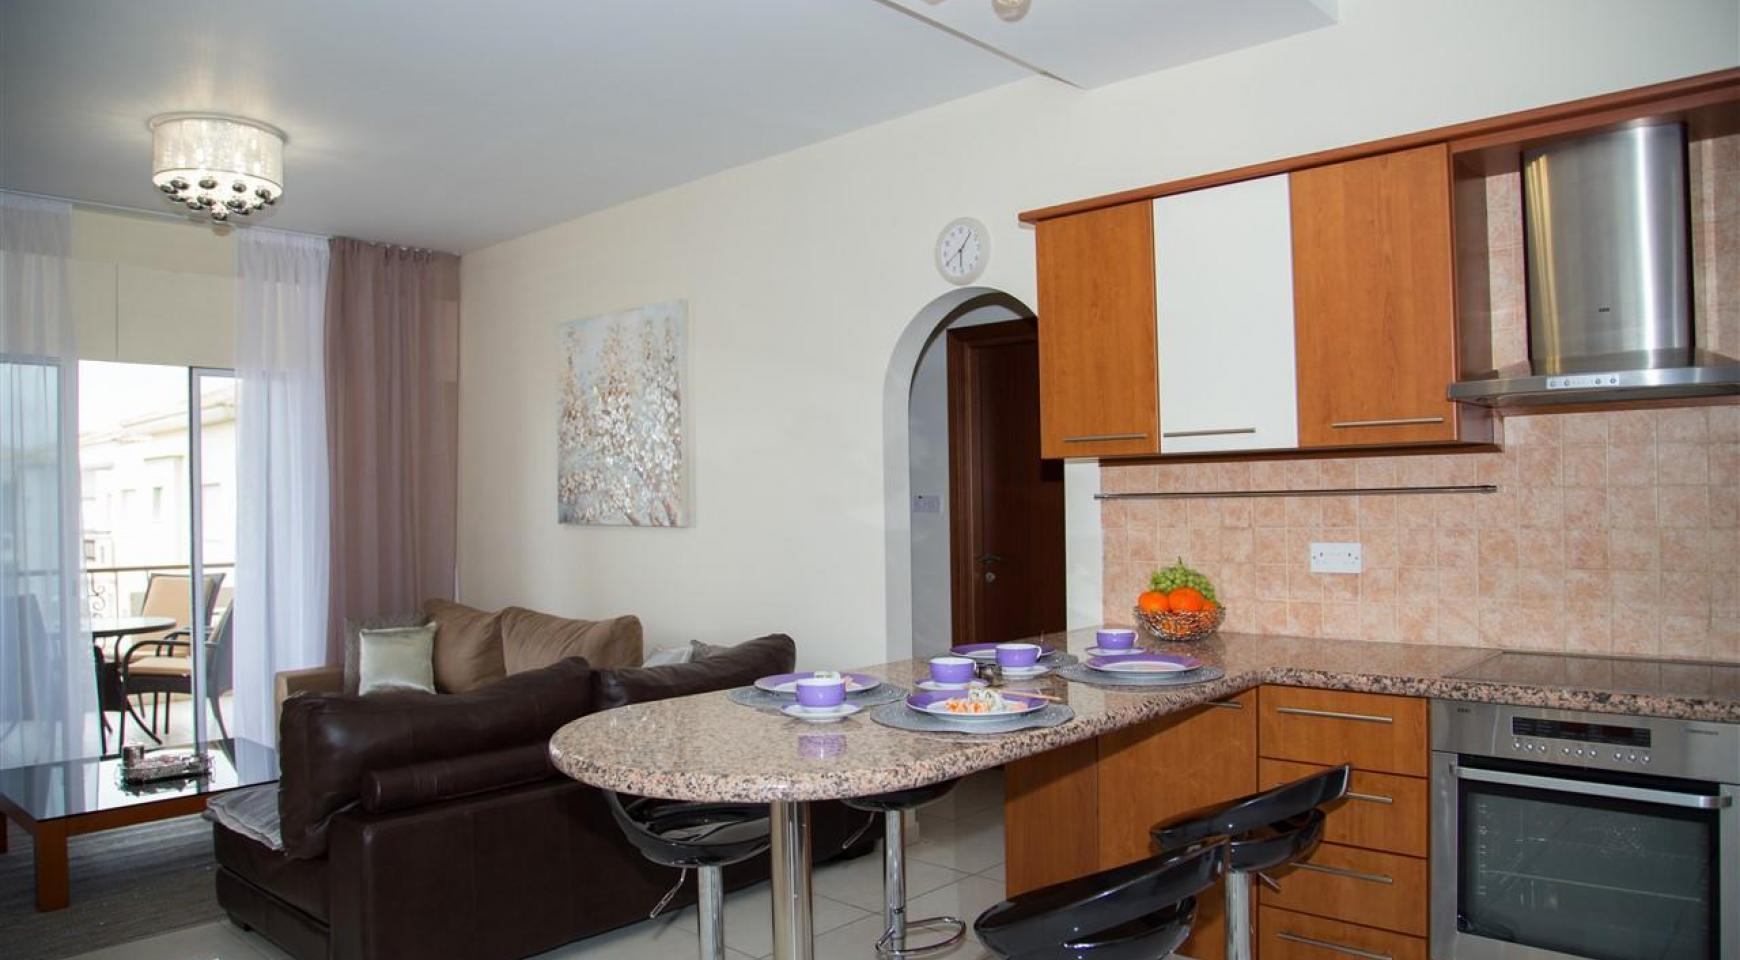 Luxury 2 Bedroom Apartment Mesogios Iris 304 in the Tourist area near the Beach - 11